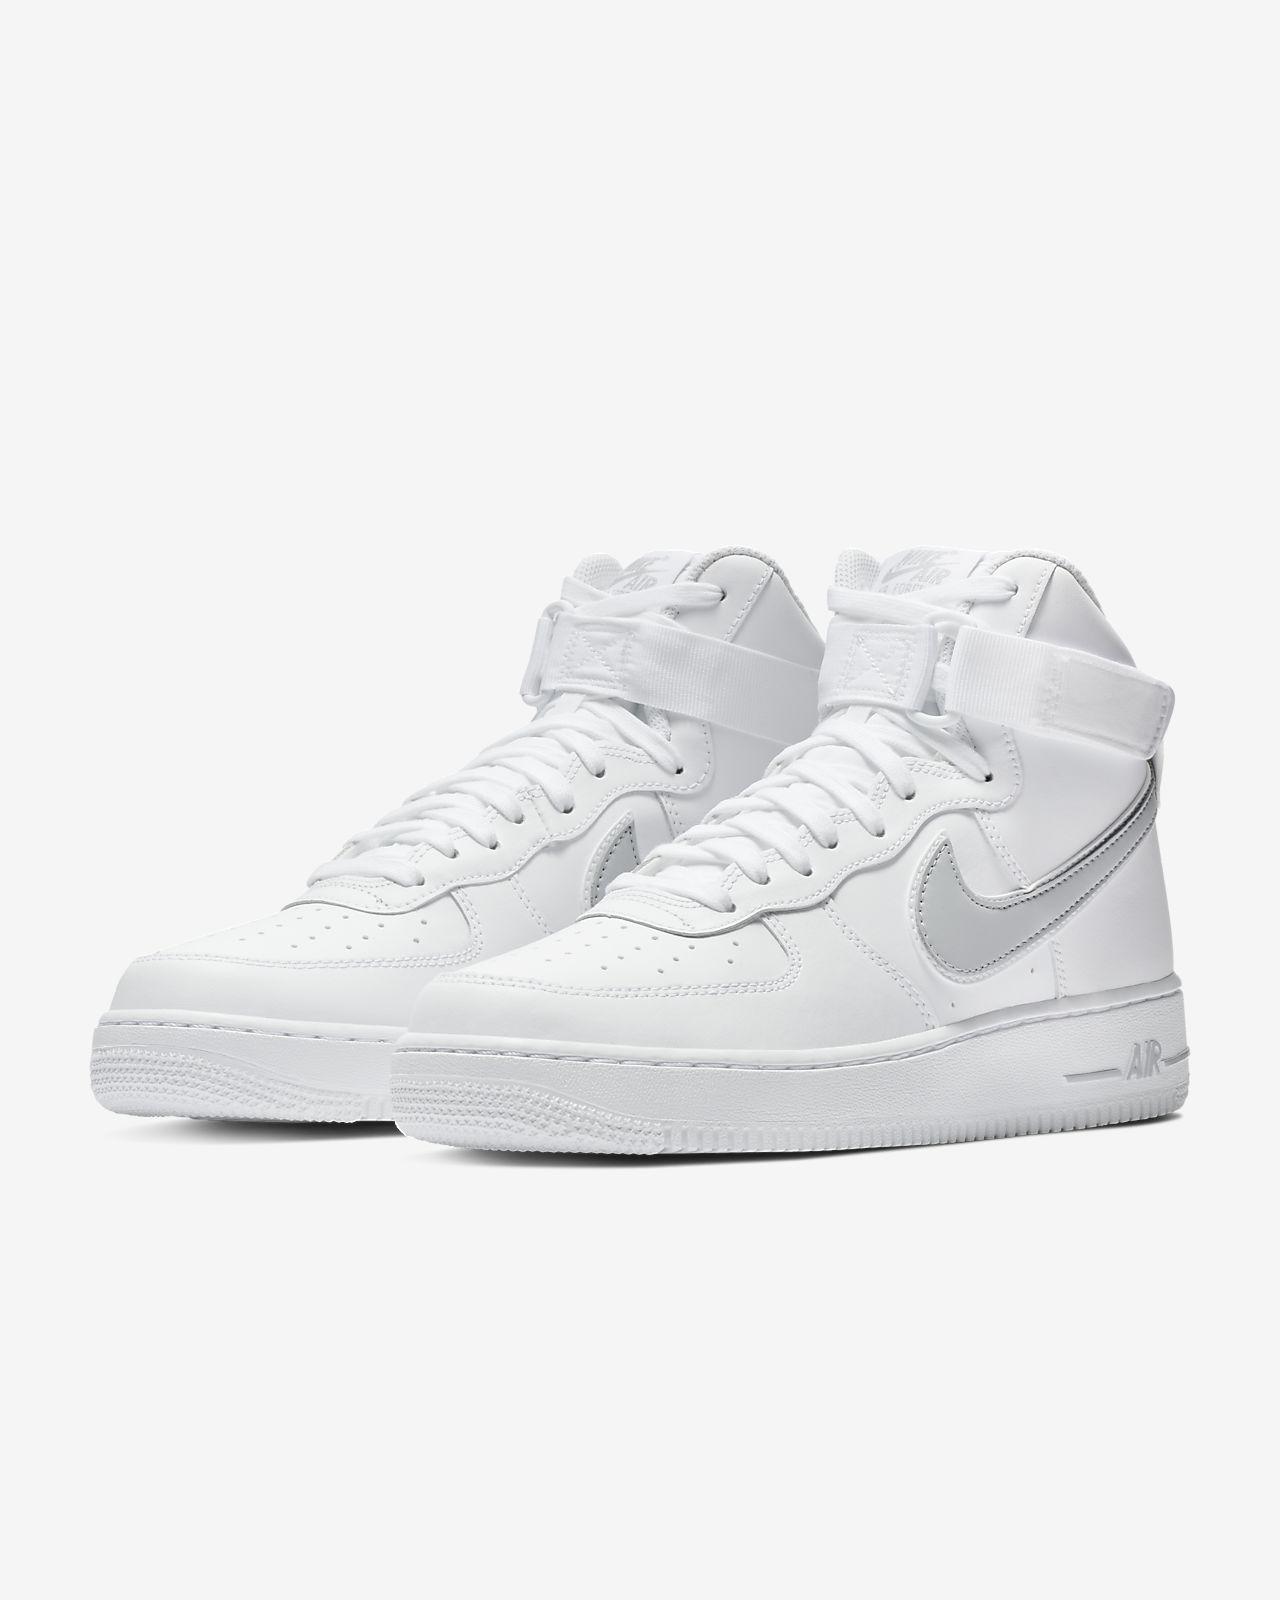 a8ab9ba1533ab Nike Air Force 1 High  07 3 Men s Shoe. Nike.com ZA